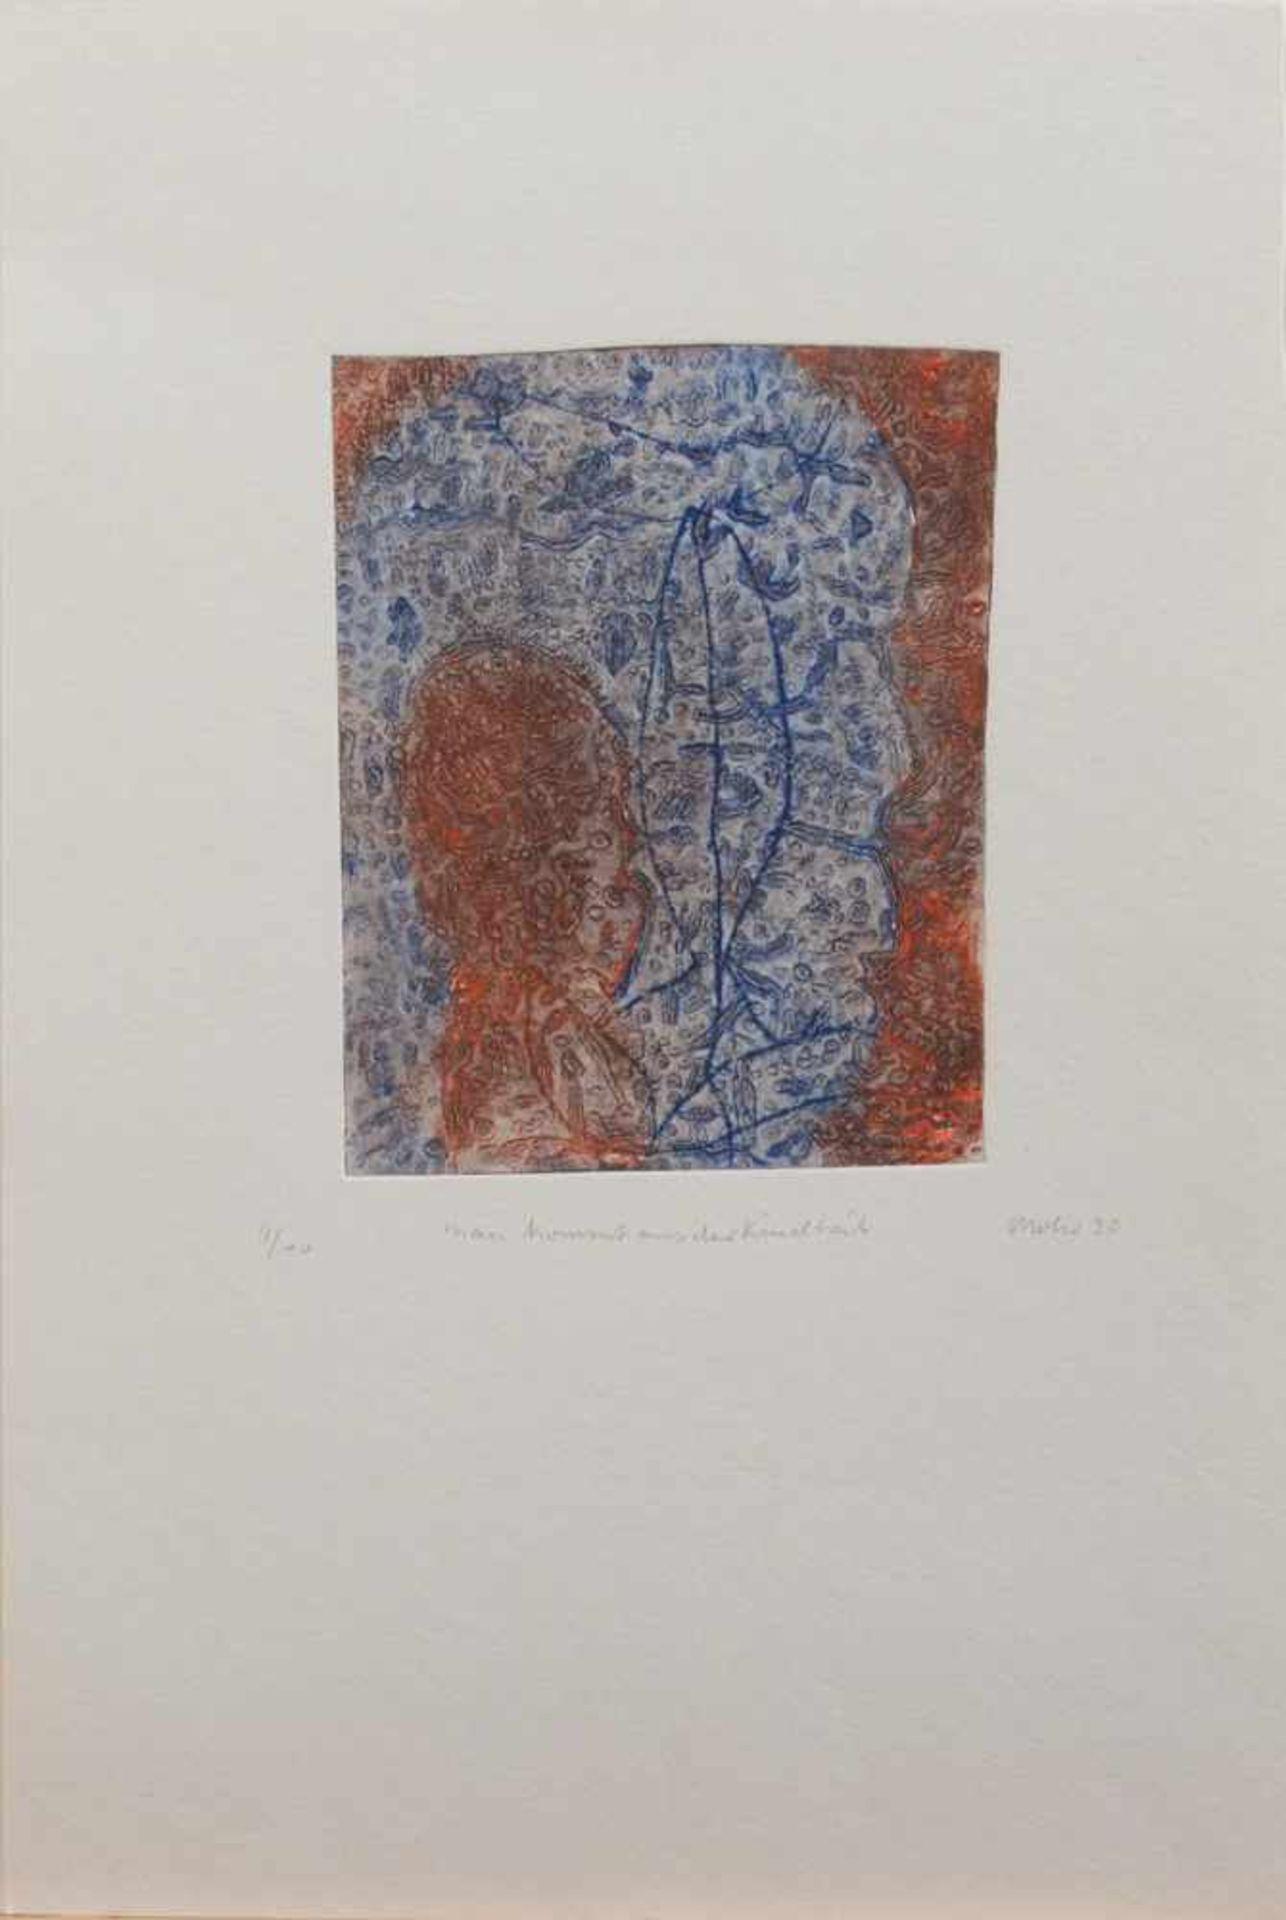 Harry Mohr(Rostock 1951 - 2014 Potsdam, deutscher Maler u. Grafiker, lebte u. arbeitete in Potsdam)